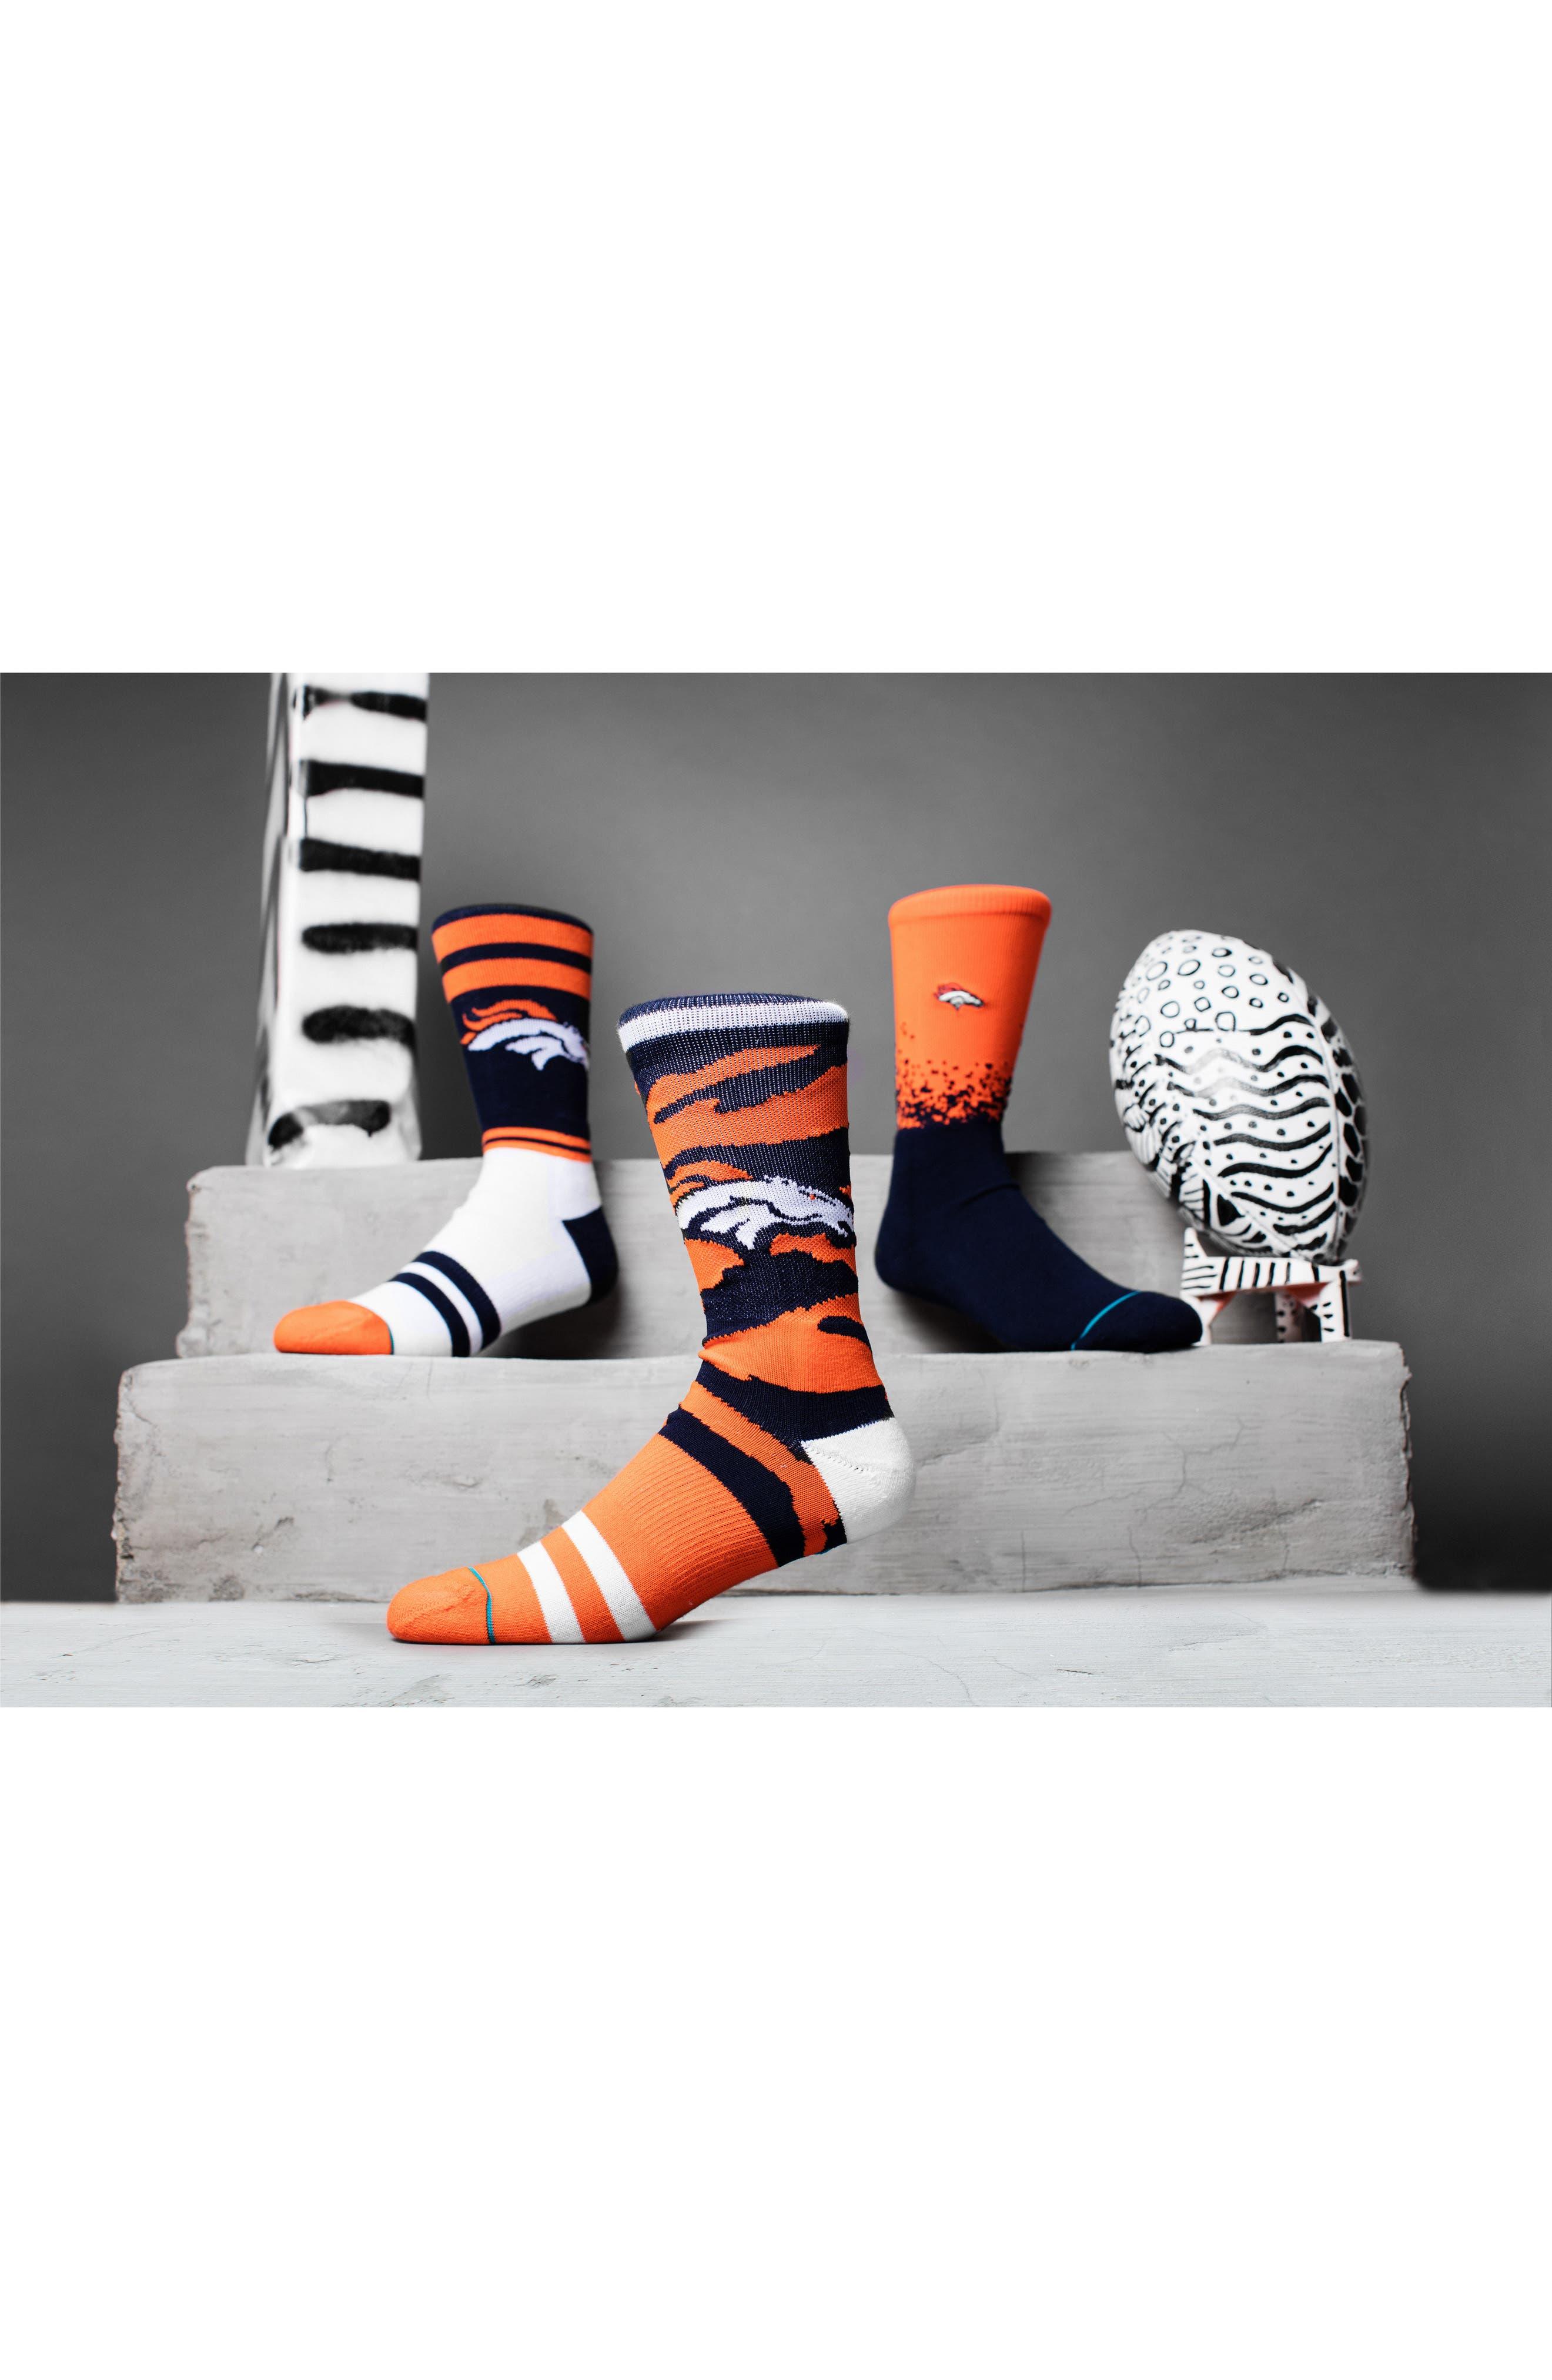 Denver Broncos - Fade Socks,                             Alternate thumbnail 4, color,                             410